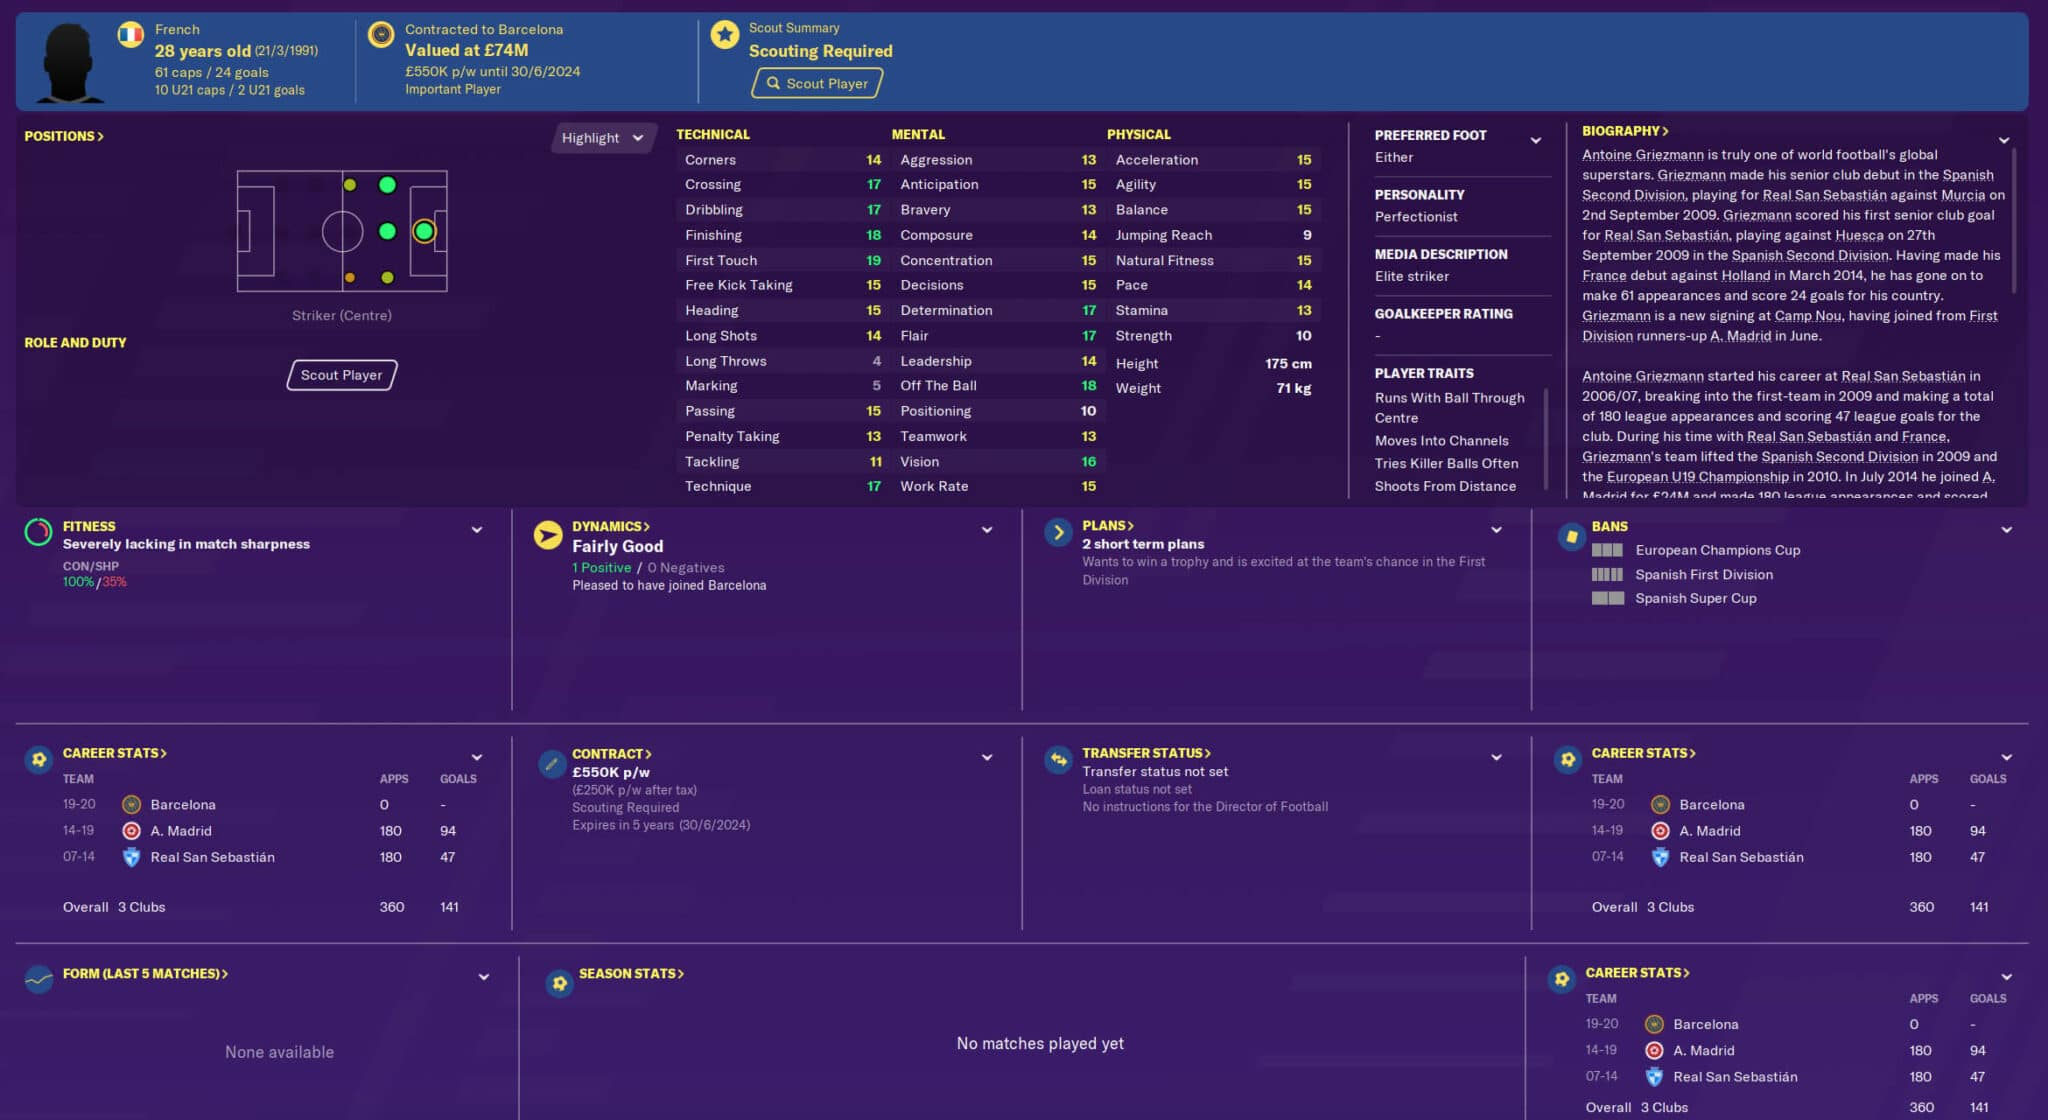 fm20 griezmann Football Manager 2020 Best Players